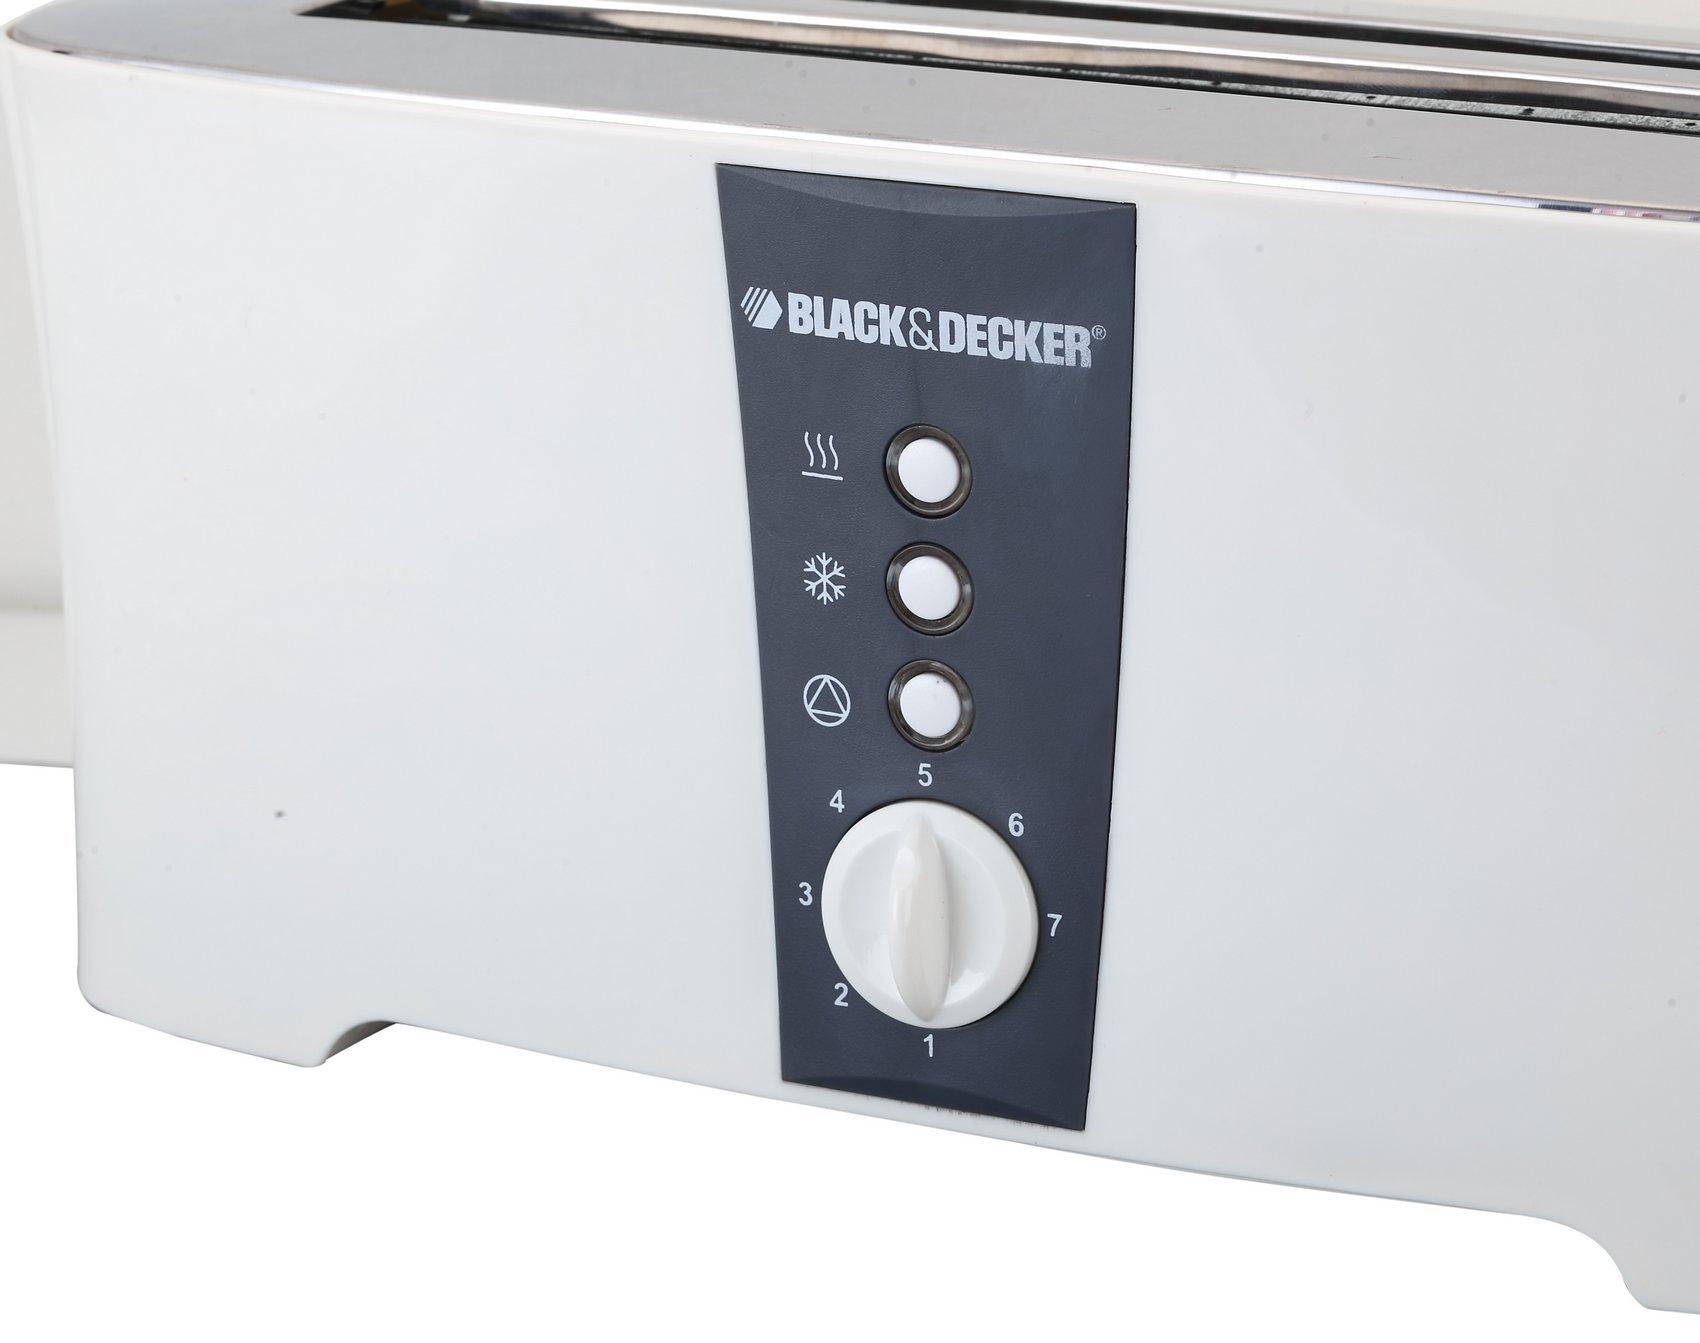 Black & Decker ET124 1350W 4-Slice Toaster (Non-USA Compliant), White by BLACK+DECKER (Image #6)